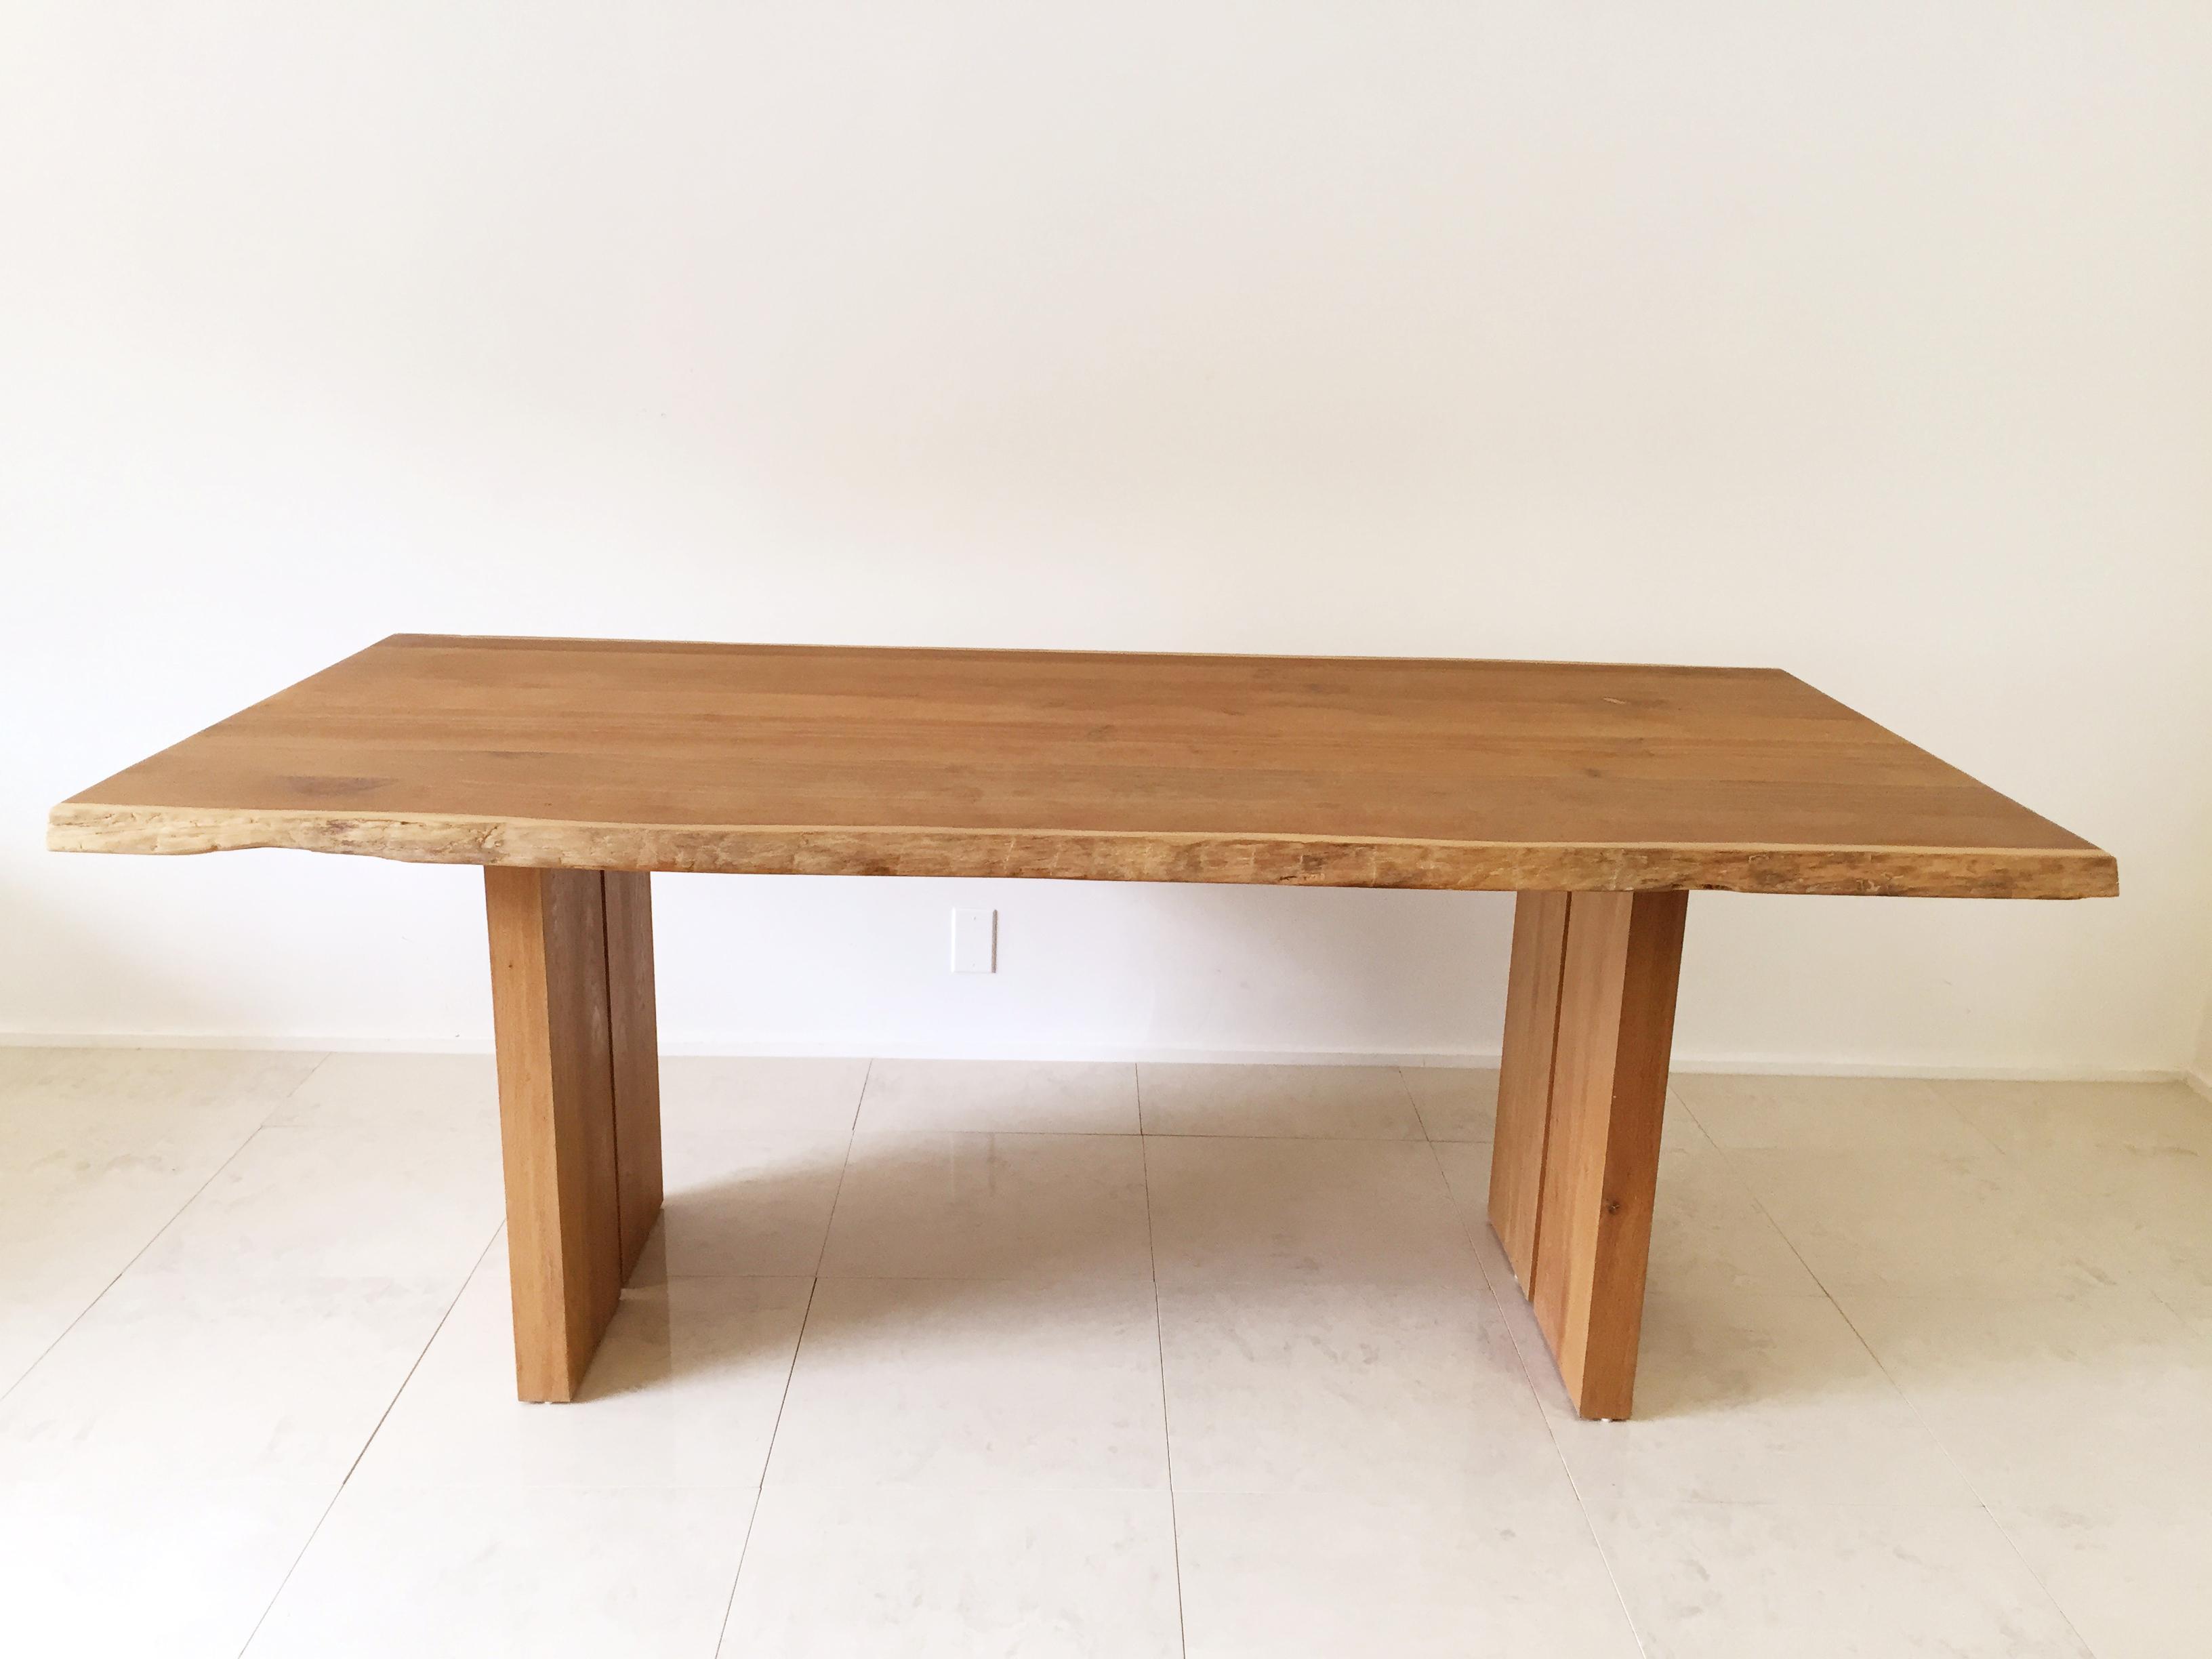 White Oak Slab Live Edge Dining Table Chairish : c636dae6 6258 40fa a314 5640b21766b0aspectfitampwidth640ampheight640 from www.chairish.com size 640 x 640 jpeg 20kB